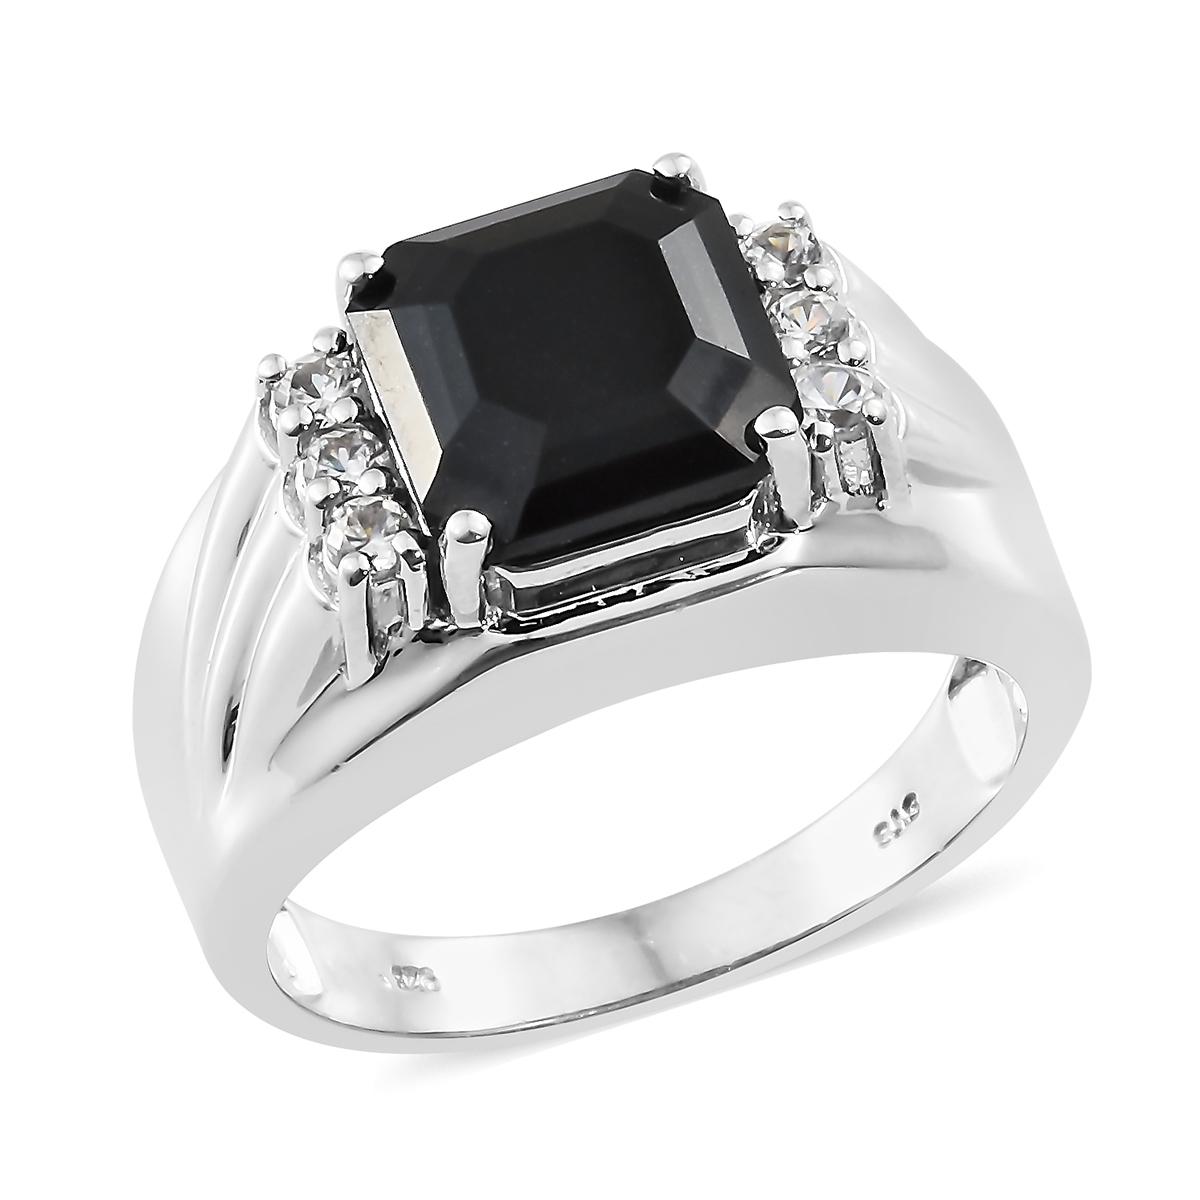 bc357d8103d19 Asscher Cut Australian Black Tourmaline, Cambodian Zircon Platinum Over  Sterling Silver Men's Ring (Size 12.0) TGW 7.32 cts.